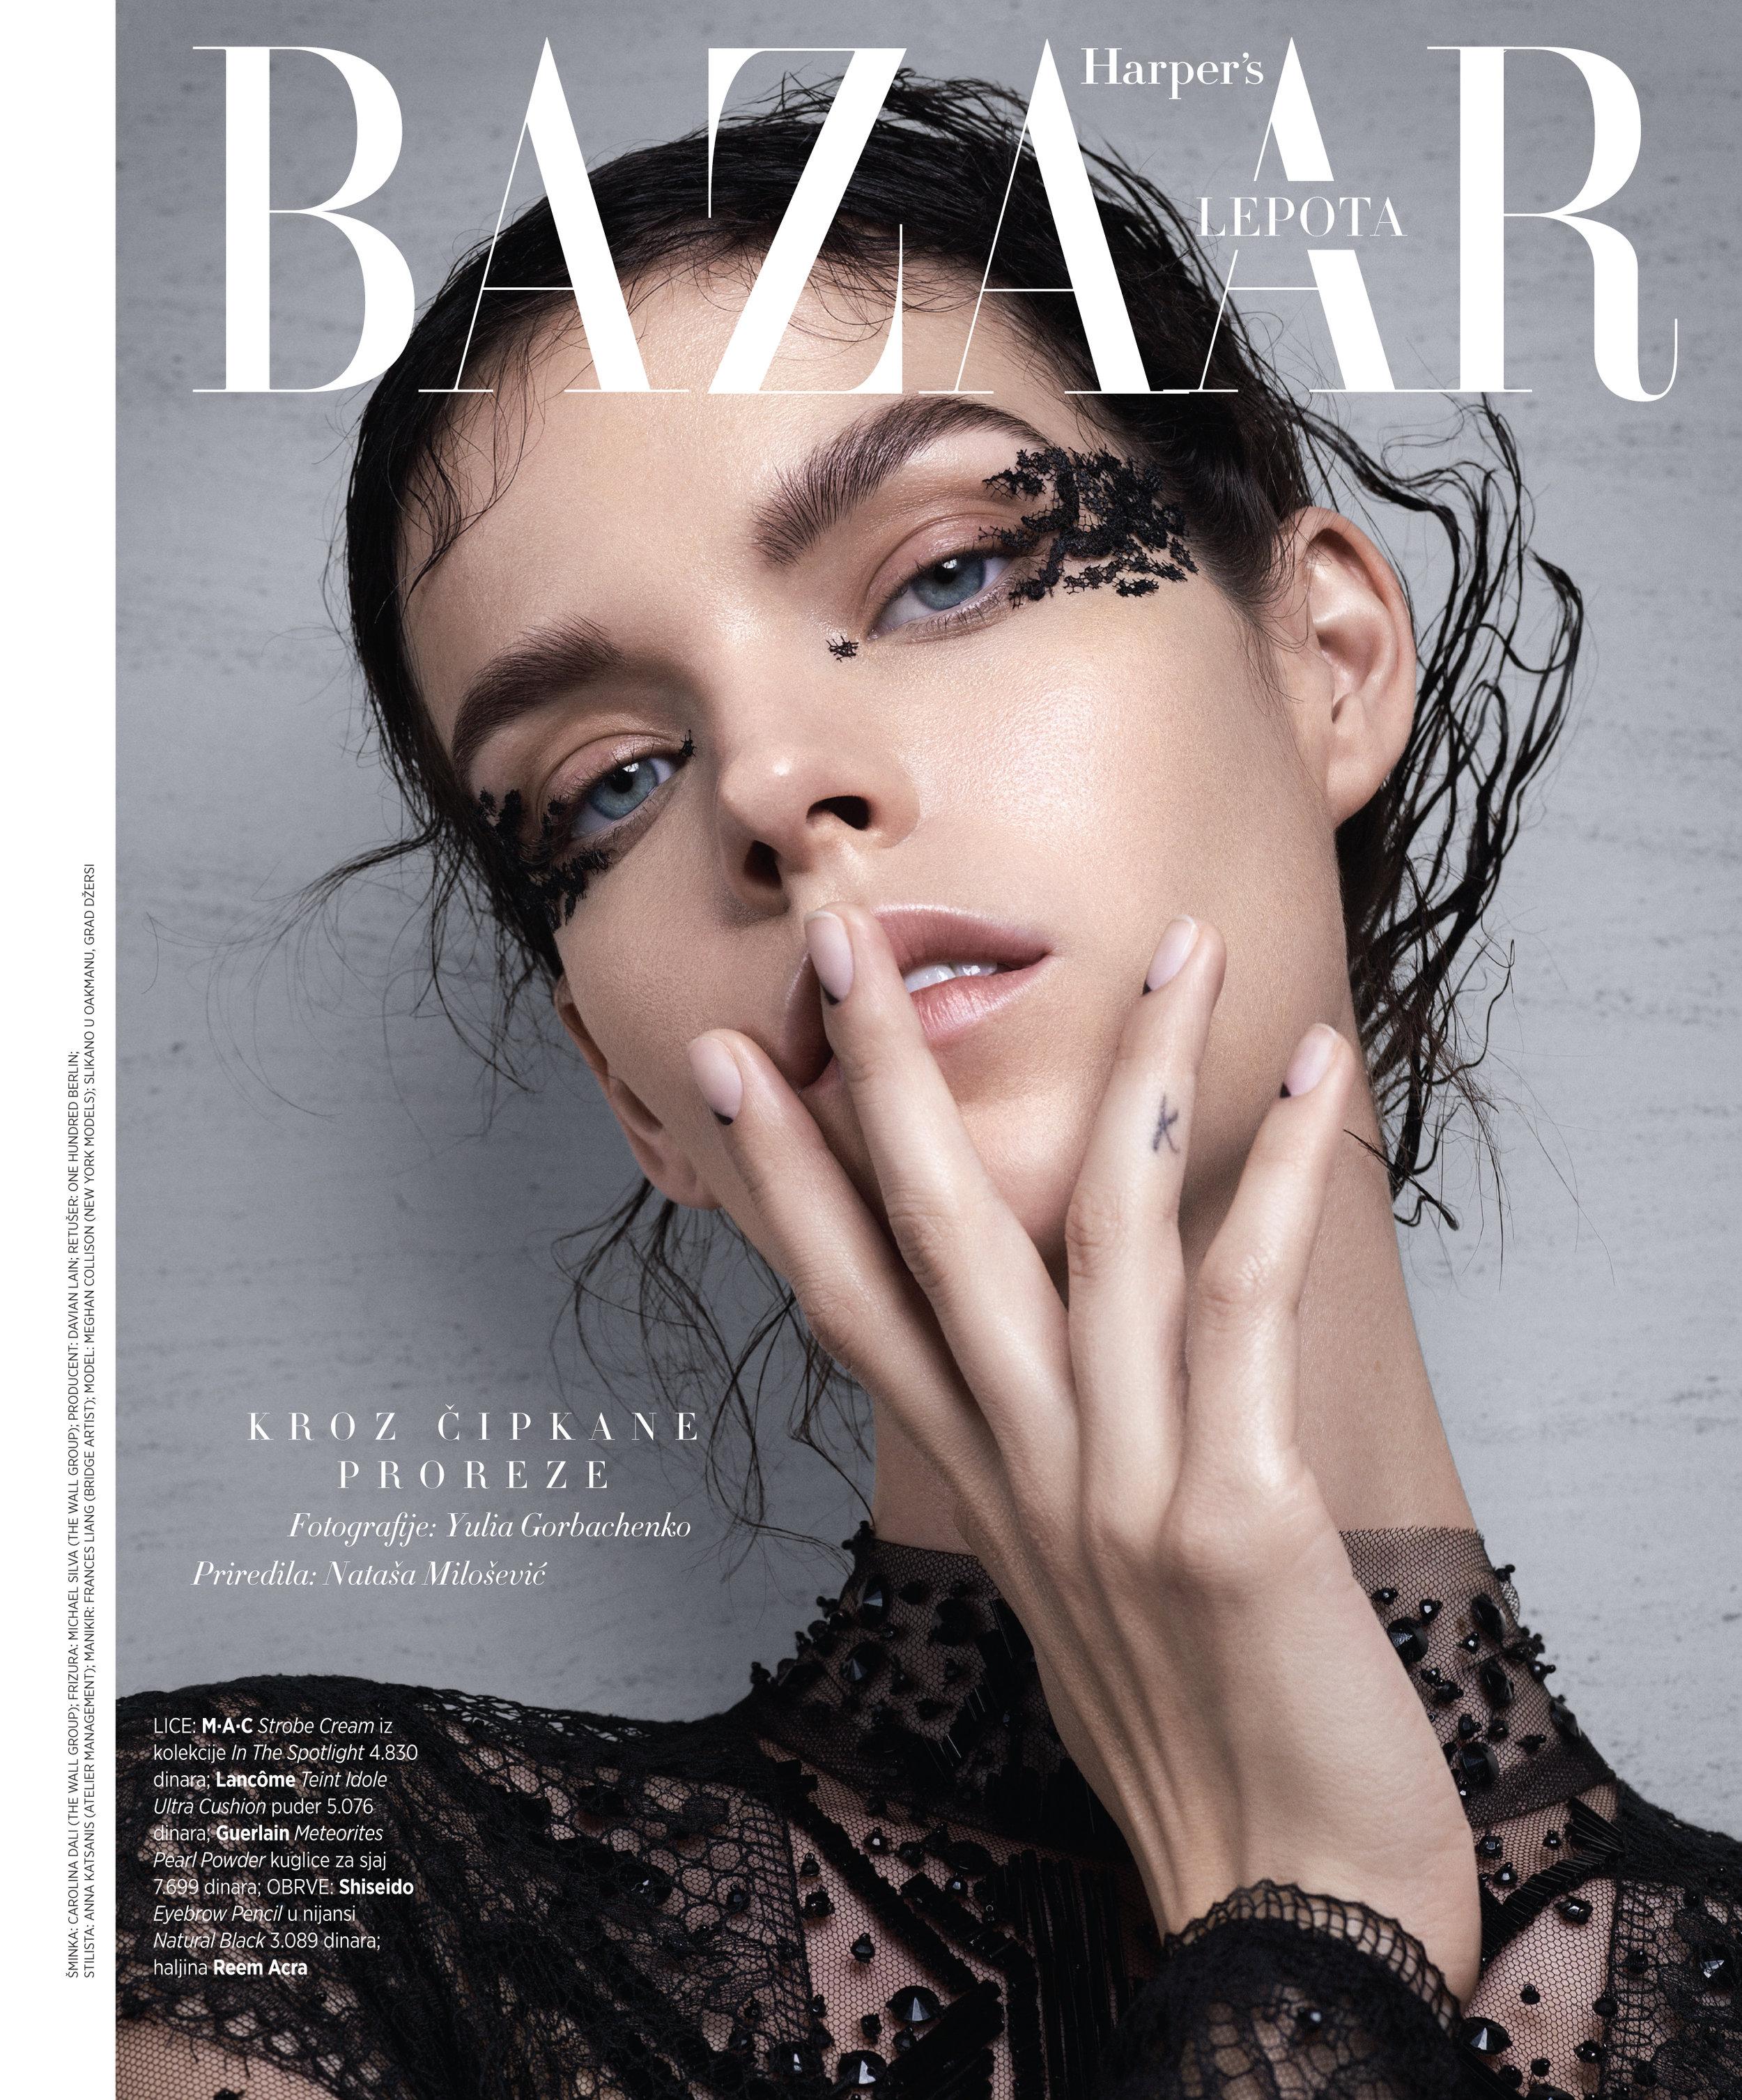 Harper's-Bazaar-Serbia-2016-12-Meghan-Collison-1.jpg